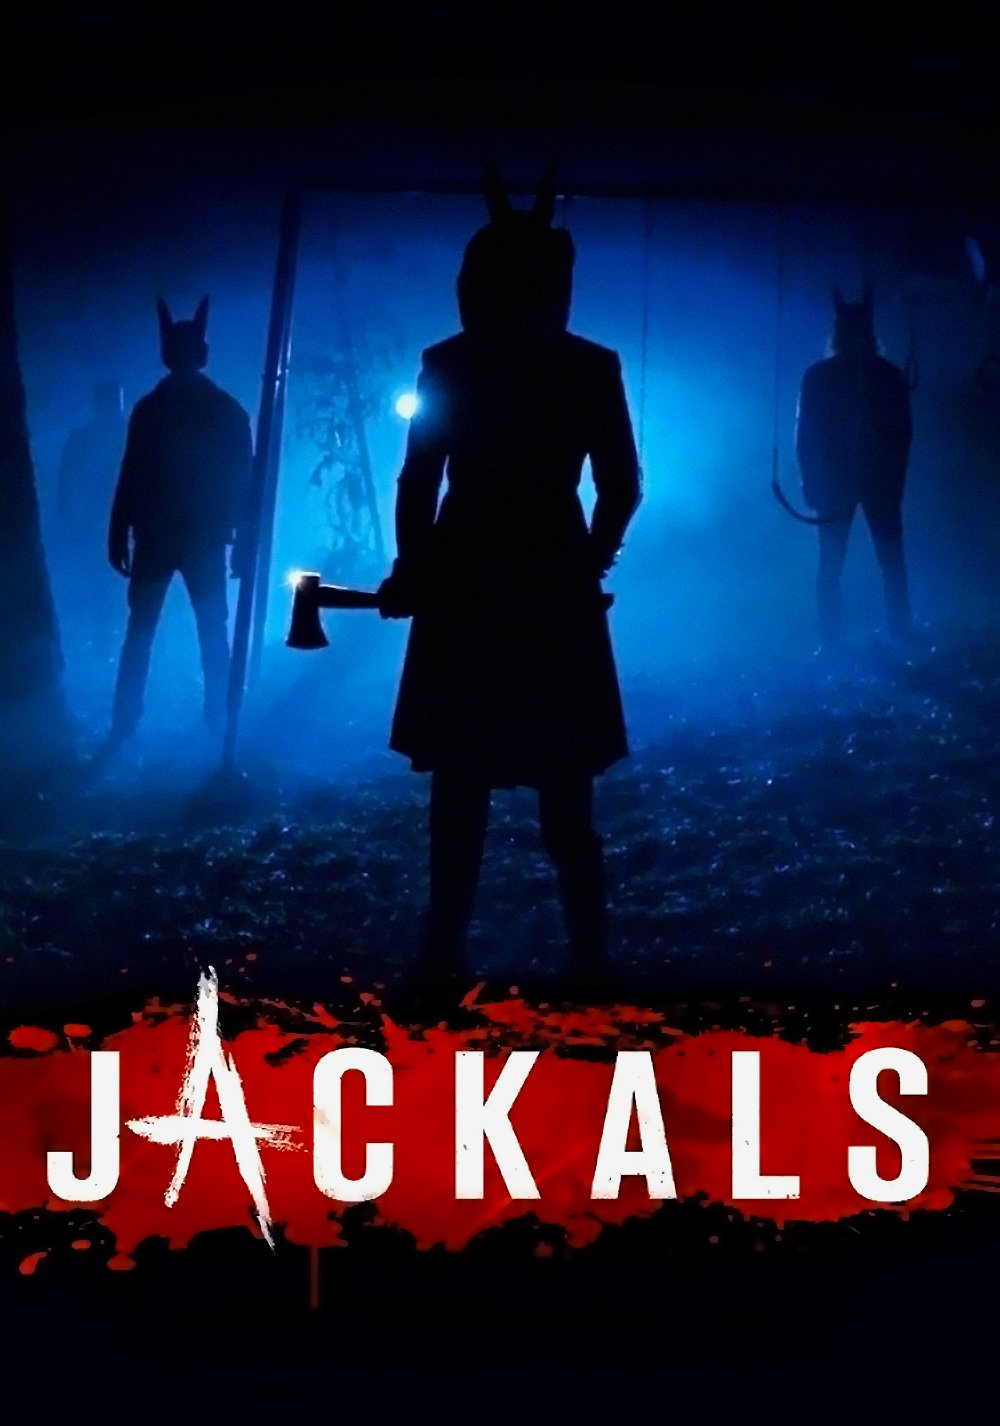 affiche du film Jackals